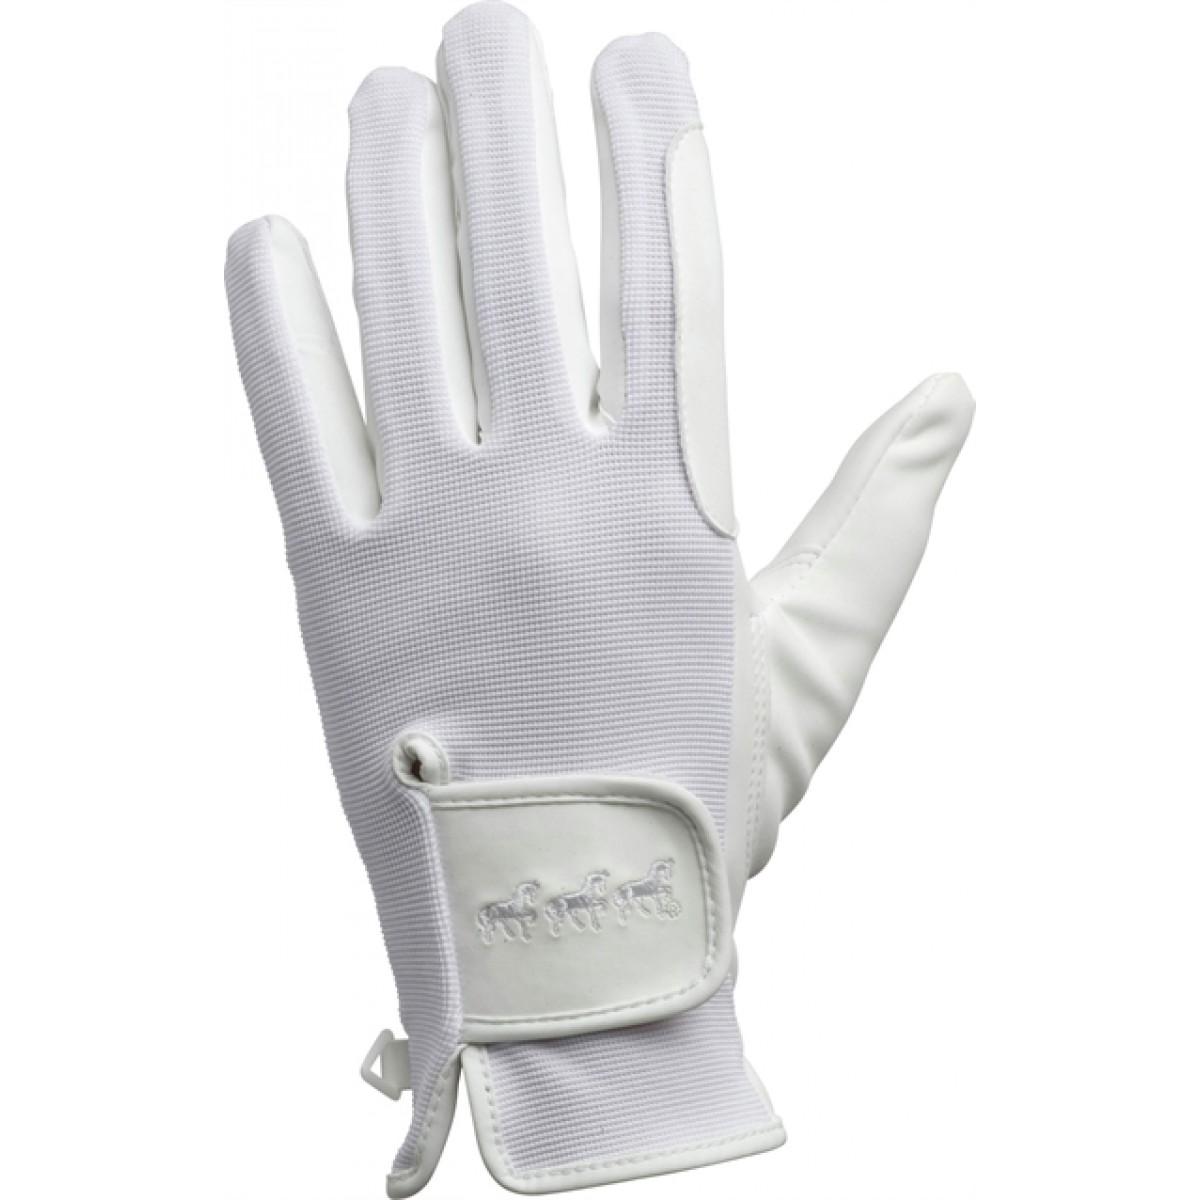 Equipage Stretch Handske